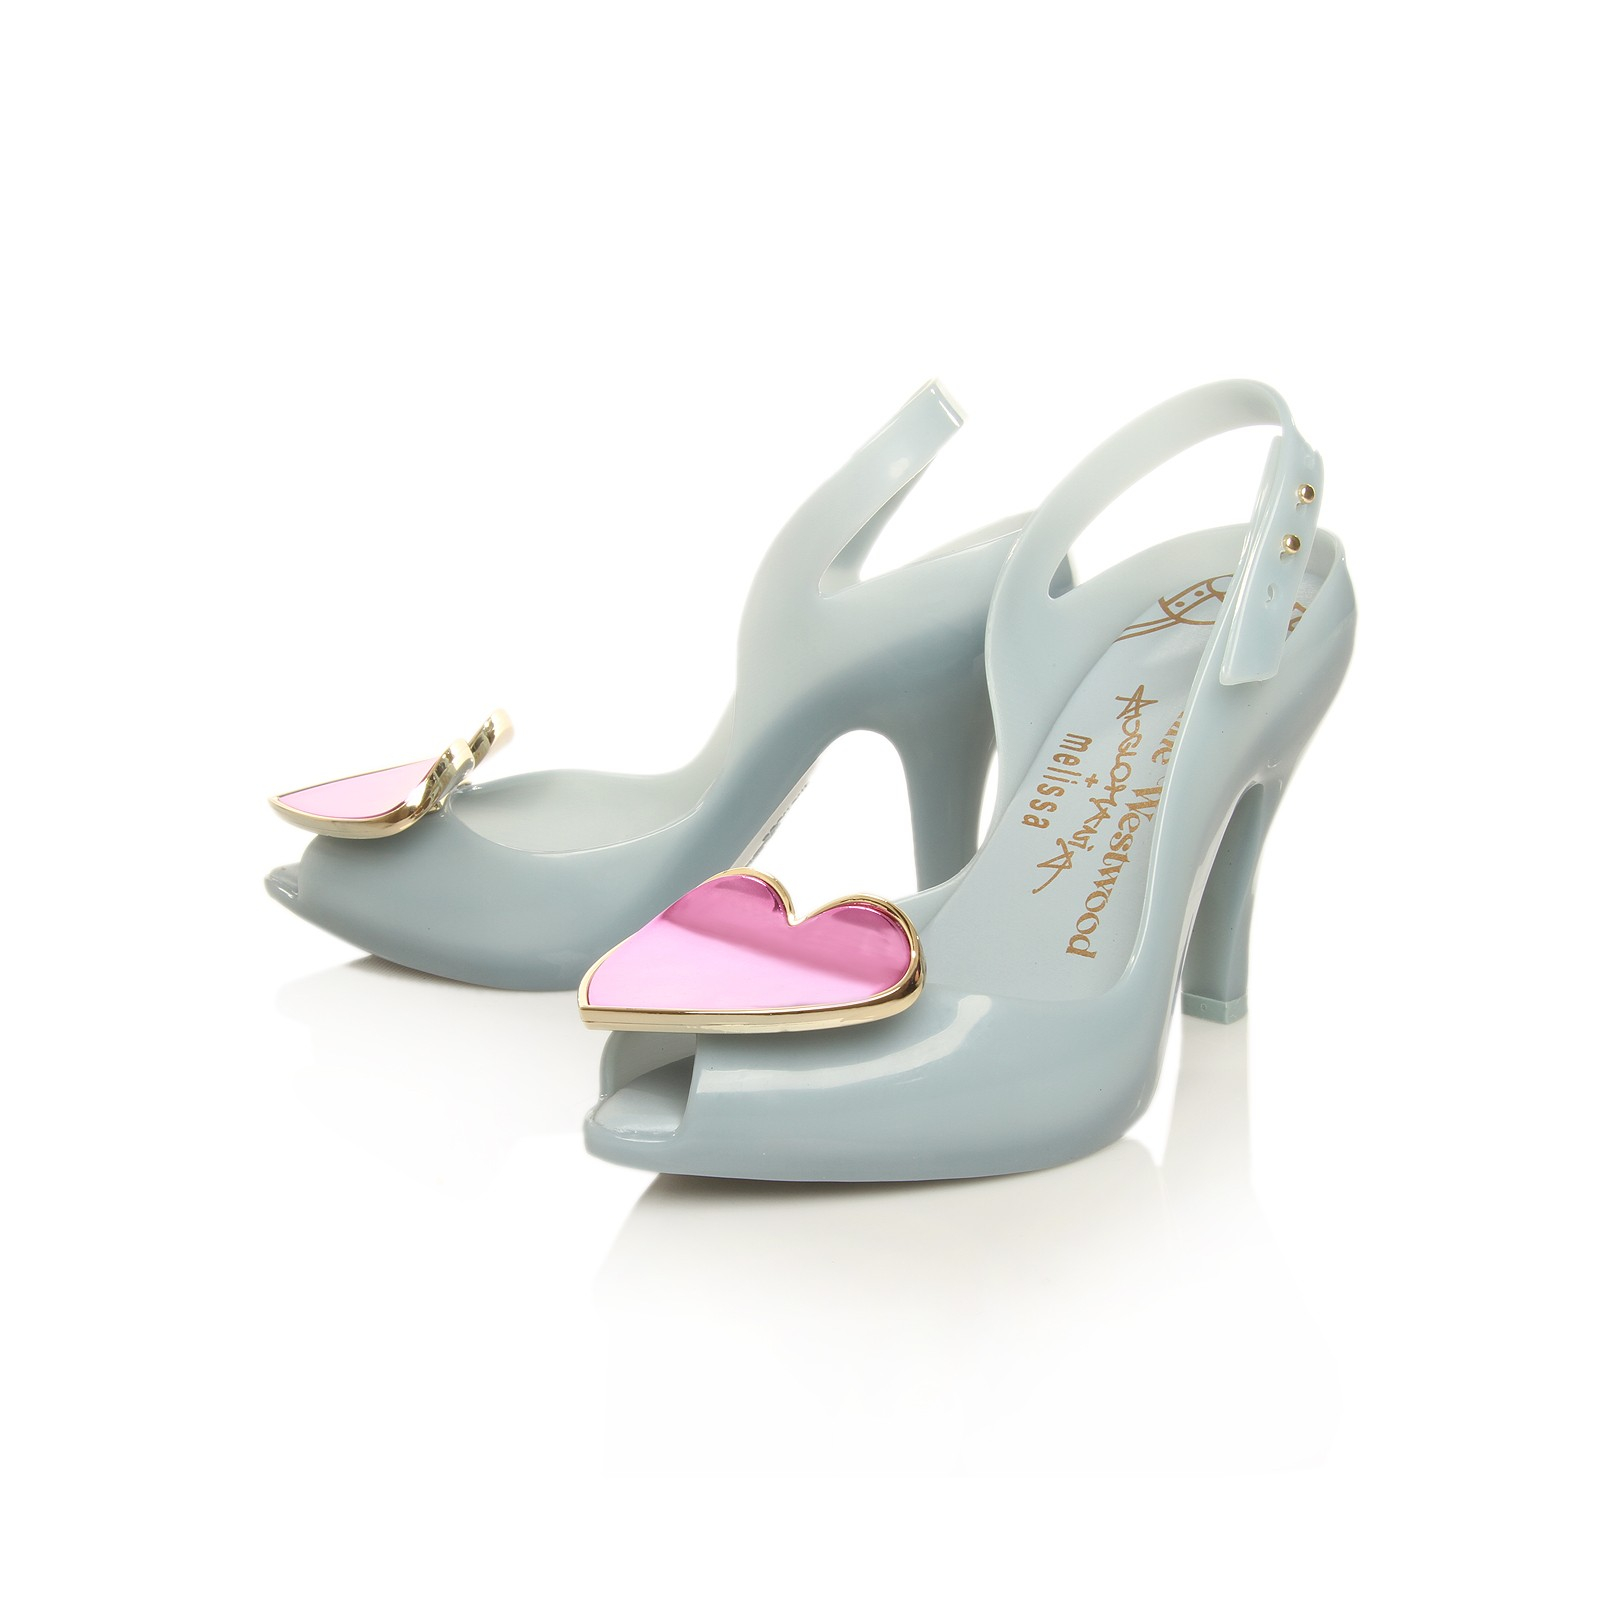 Vivienne Westwood Anglomania Shoes Blue